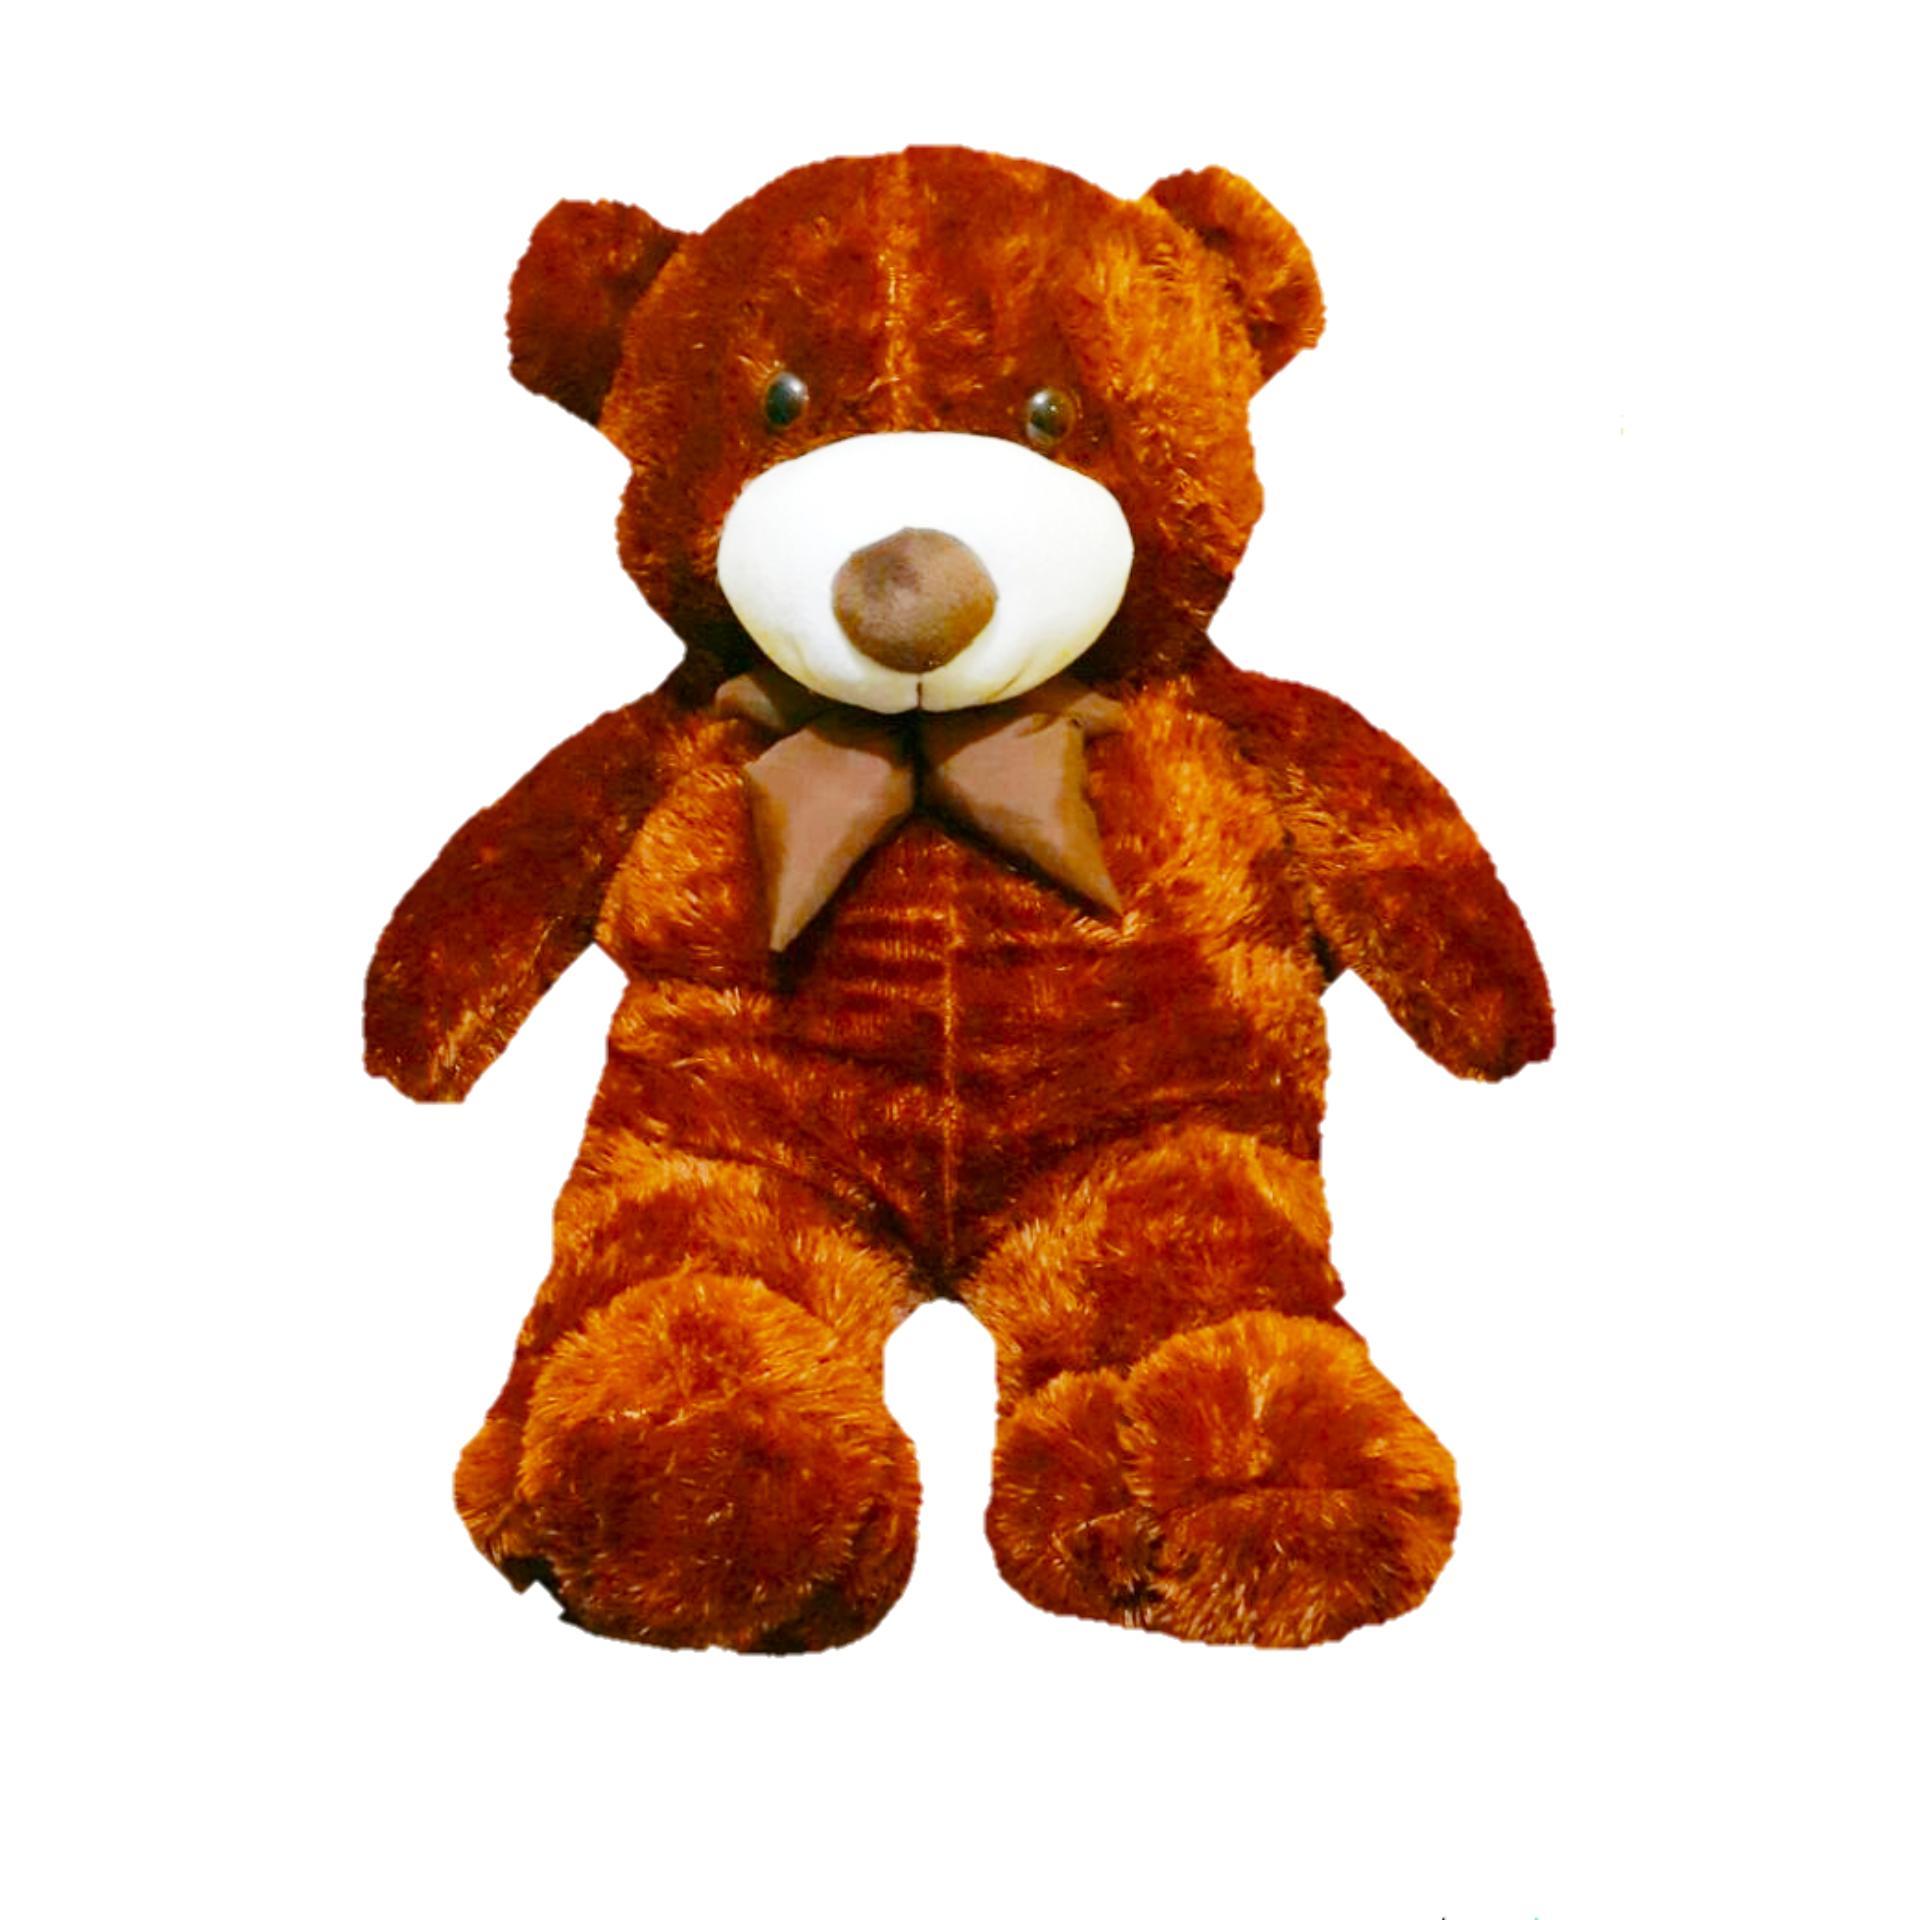 ... Inno Foto Kaligrafi Arab Annas Al Falaq Mekah 107x86 Inchi Hitam Source Teddy Bear Beruang boneka